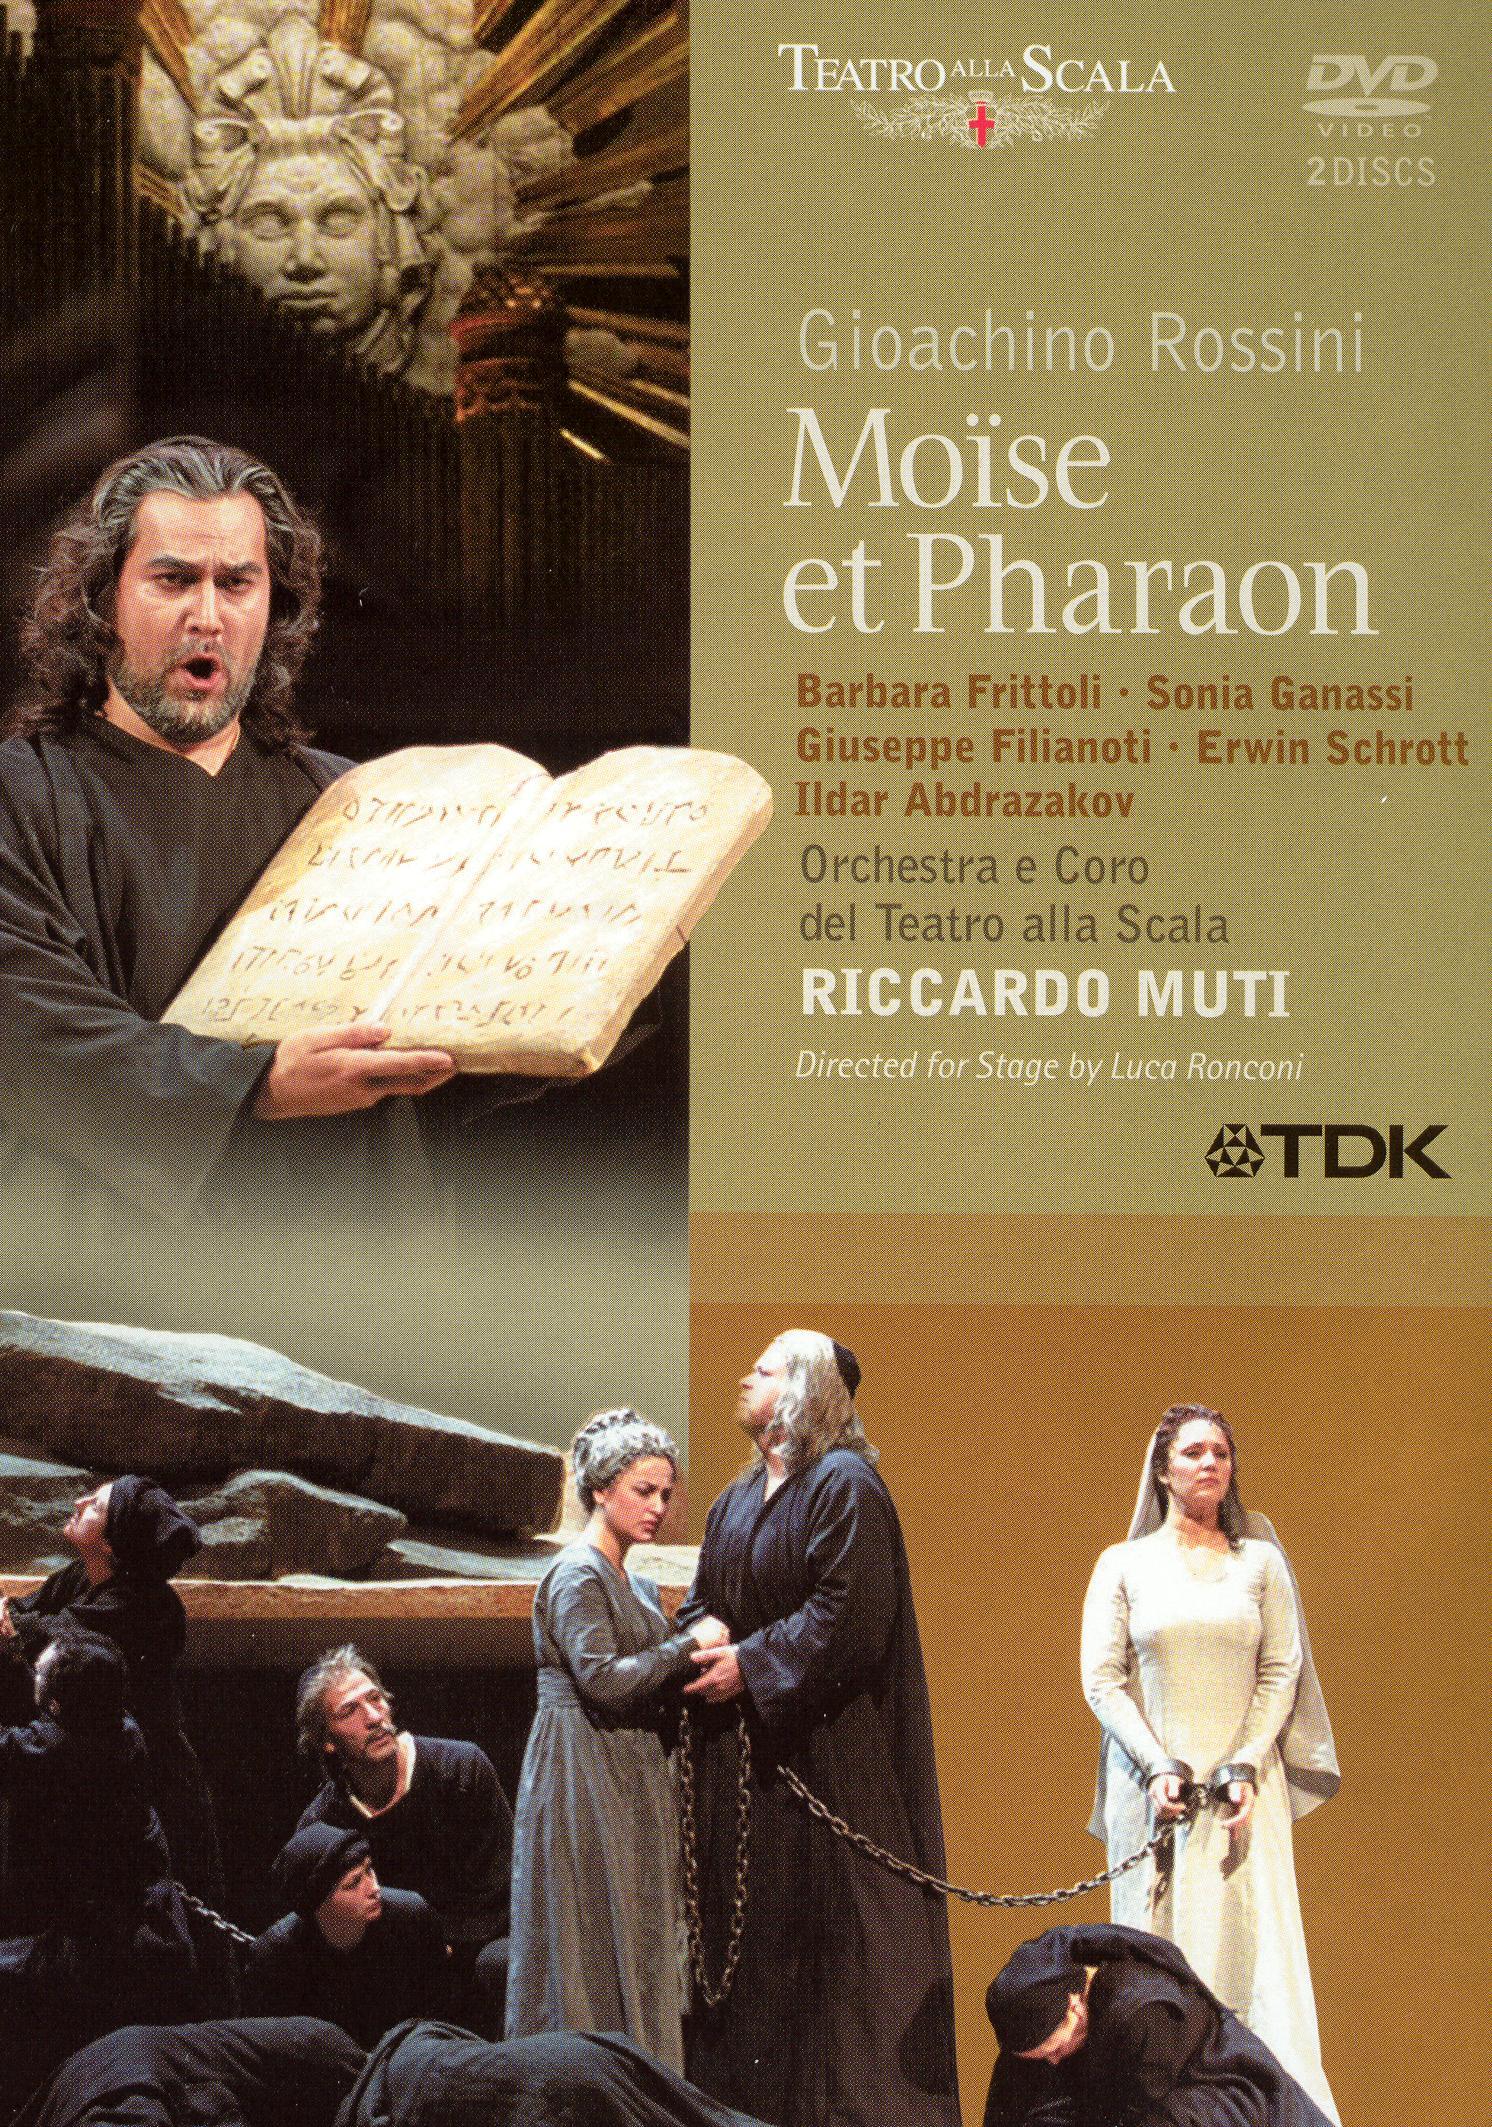 Moïse et Pharaon (Teatro alla Scala)